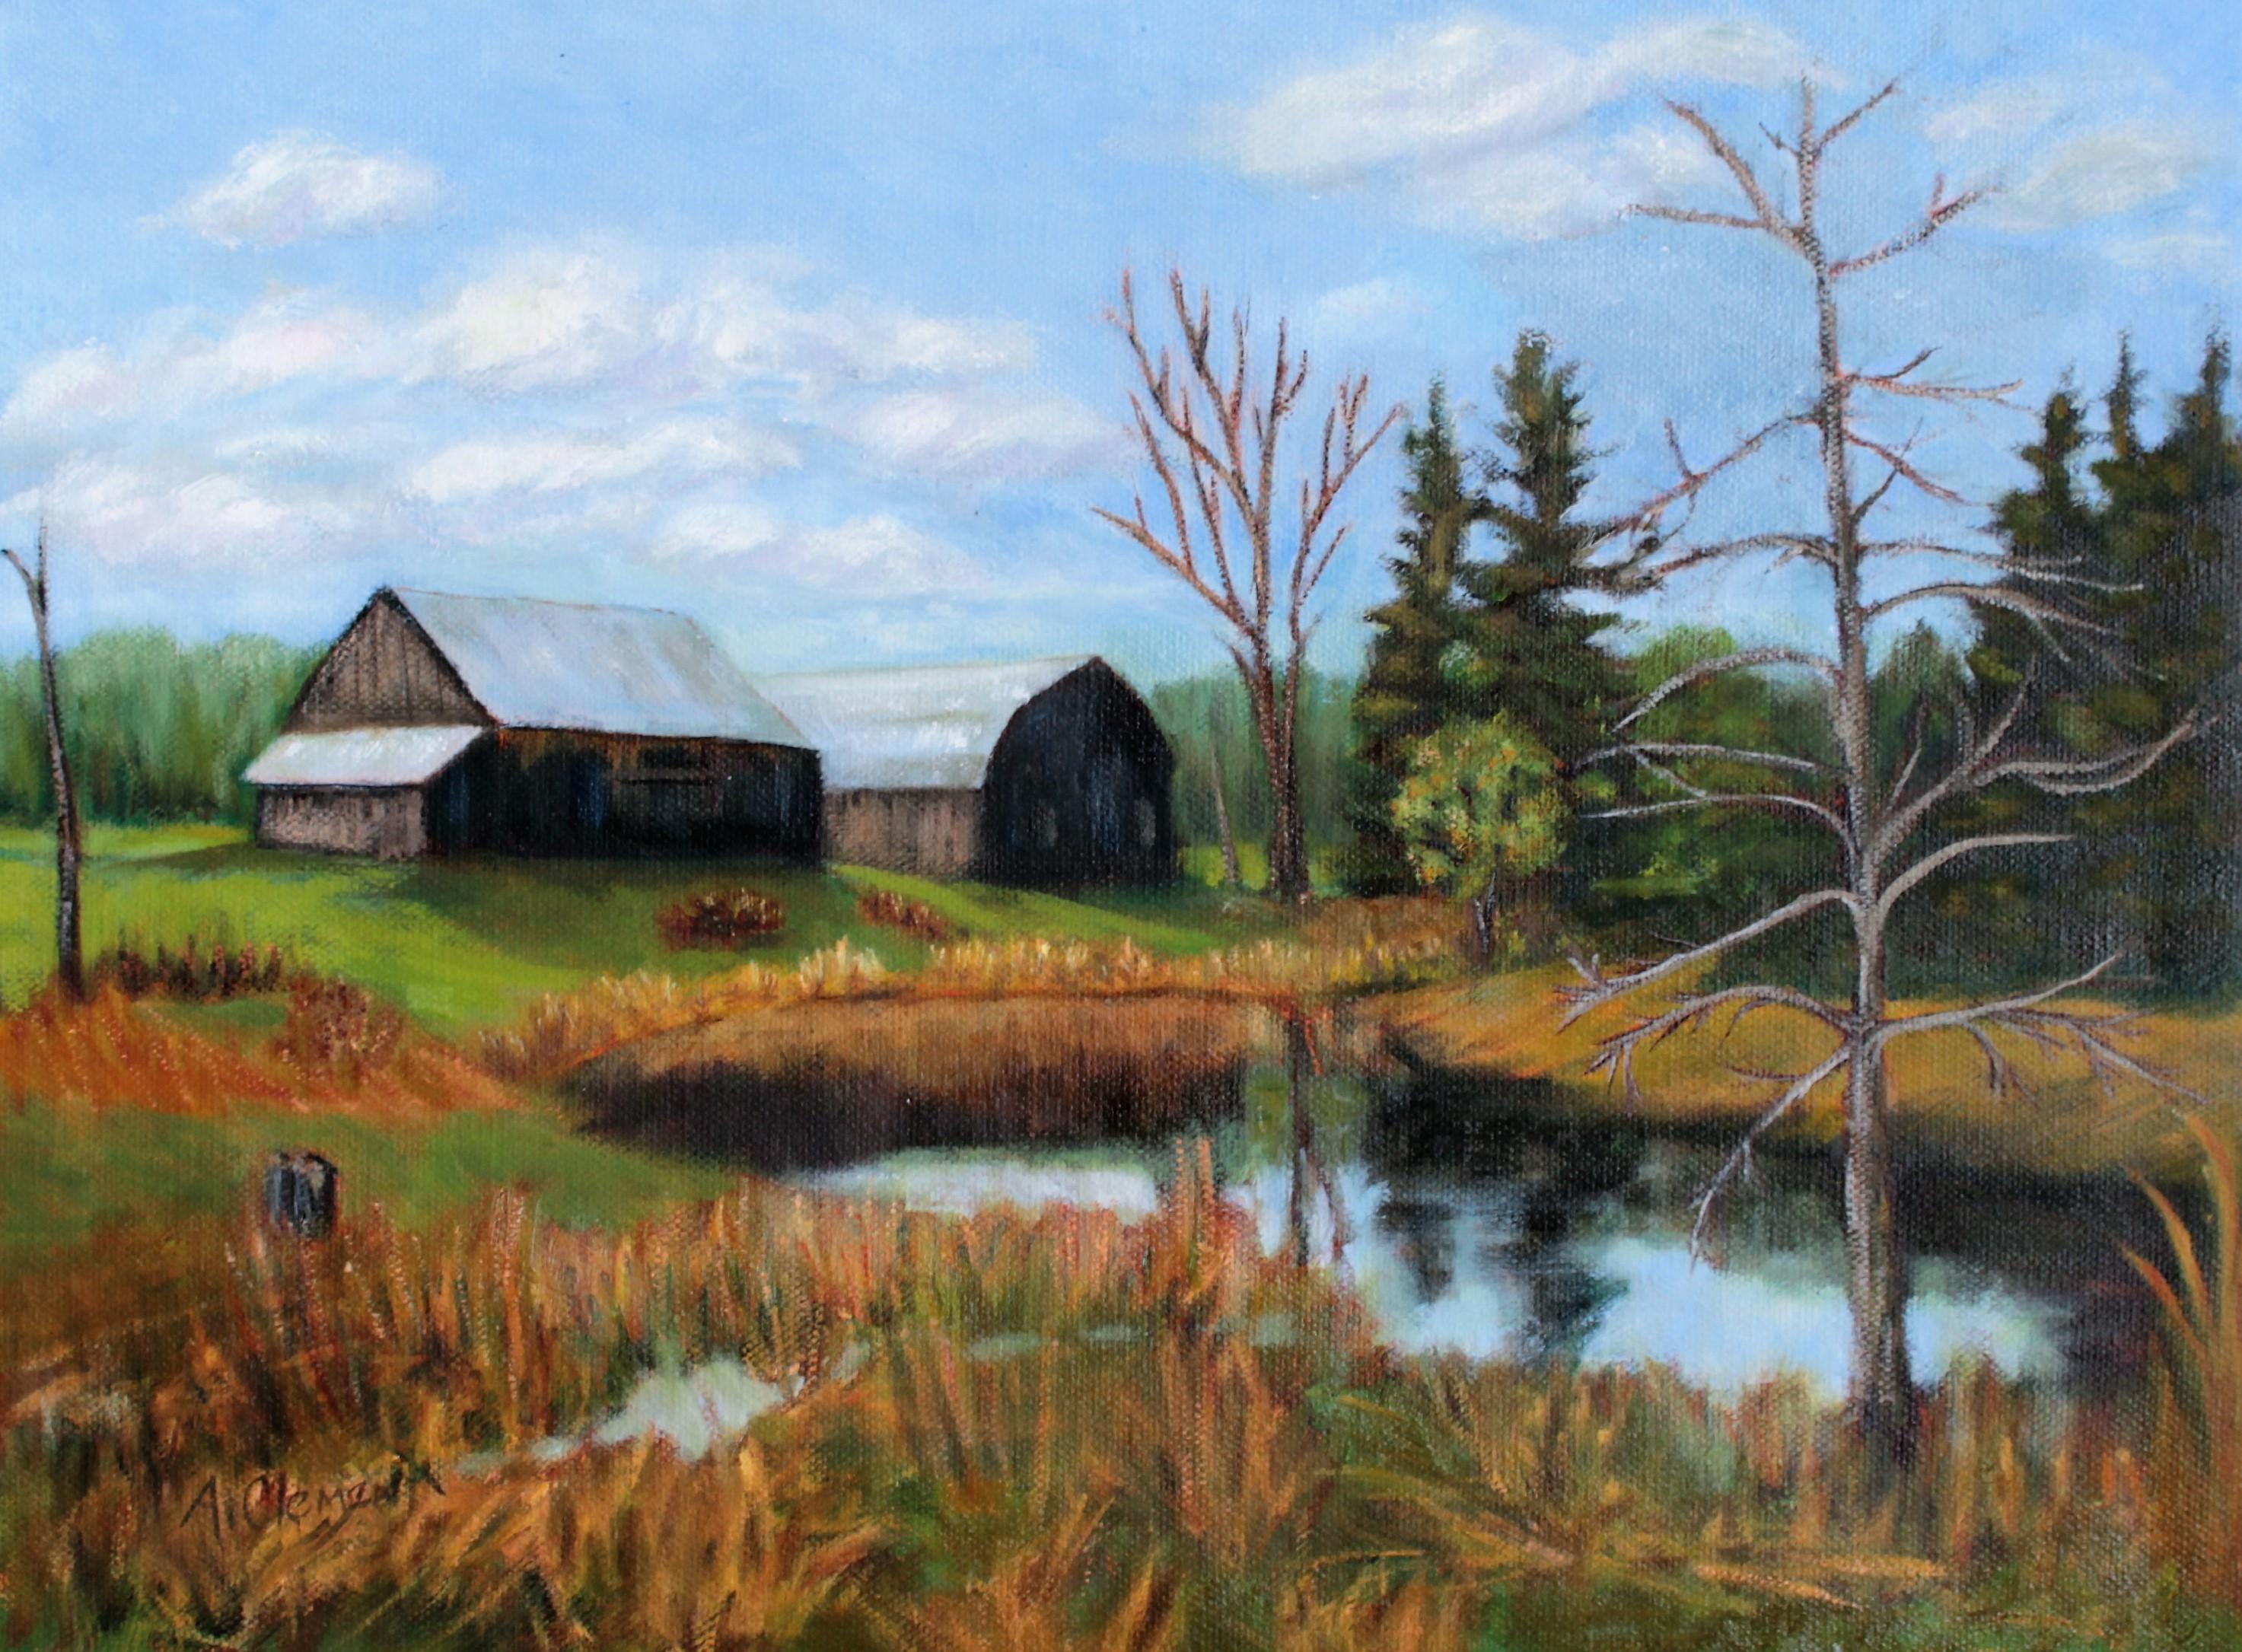 Ruth's Barn #3